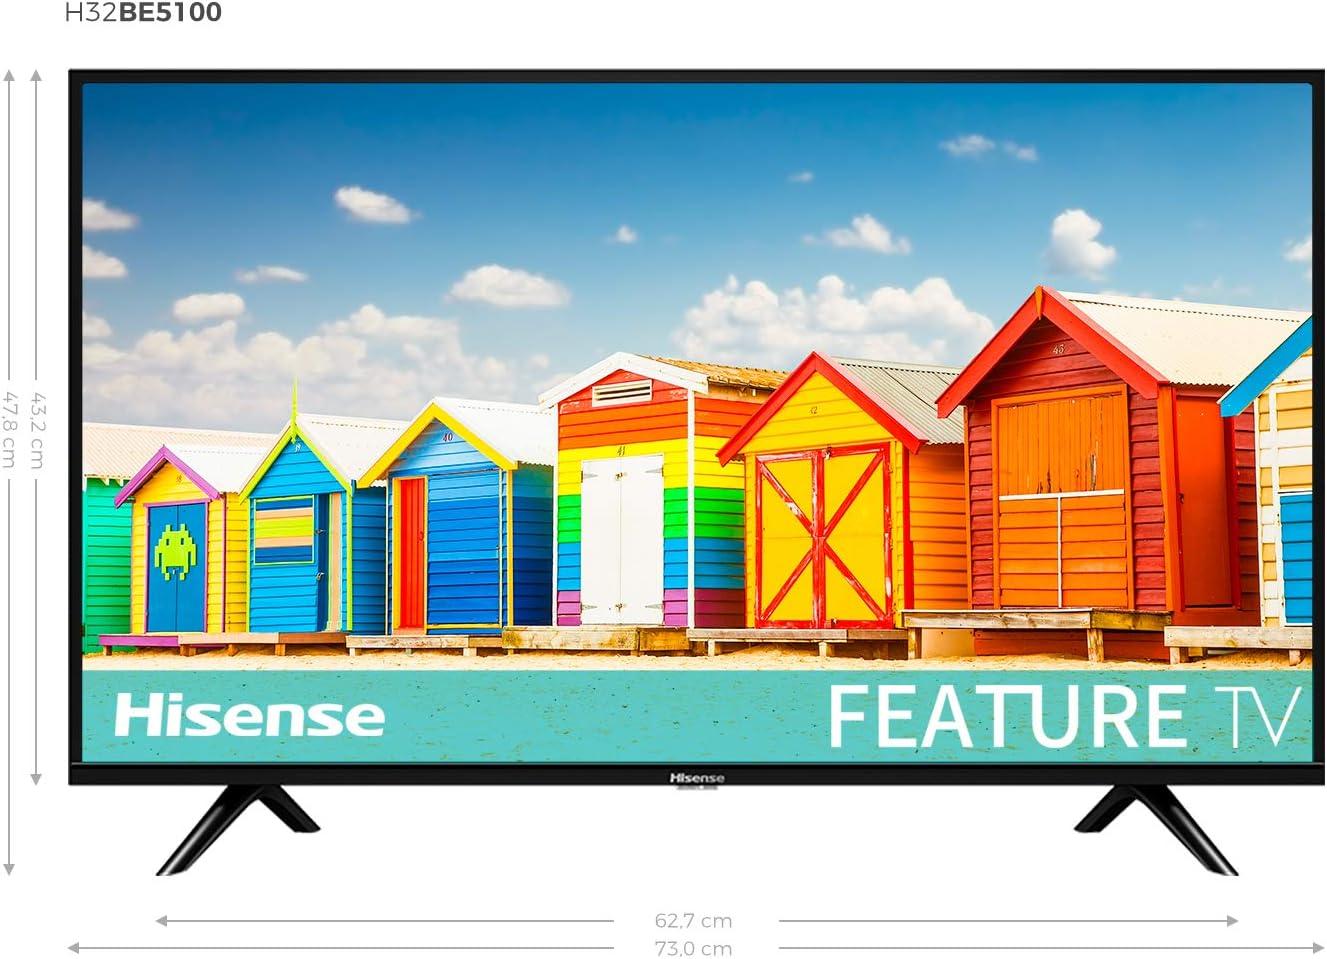 Hisense H32B5100 - TV Led HD, 2 HDMI, 1 USB, Salida Óptica, Audio DD+. [Clase de eficiencia energética A]: Hisense: Amazon.es: Electrónica